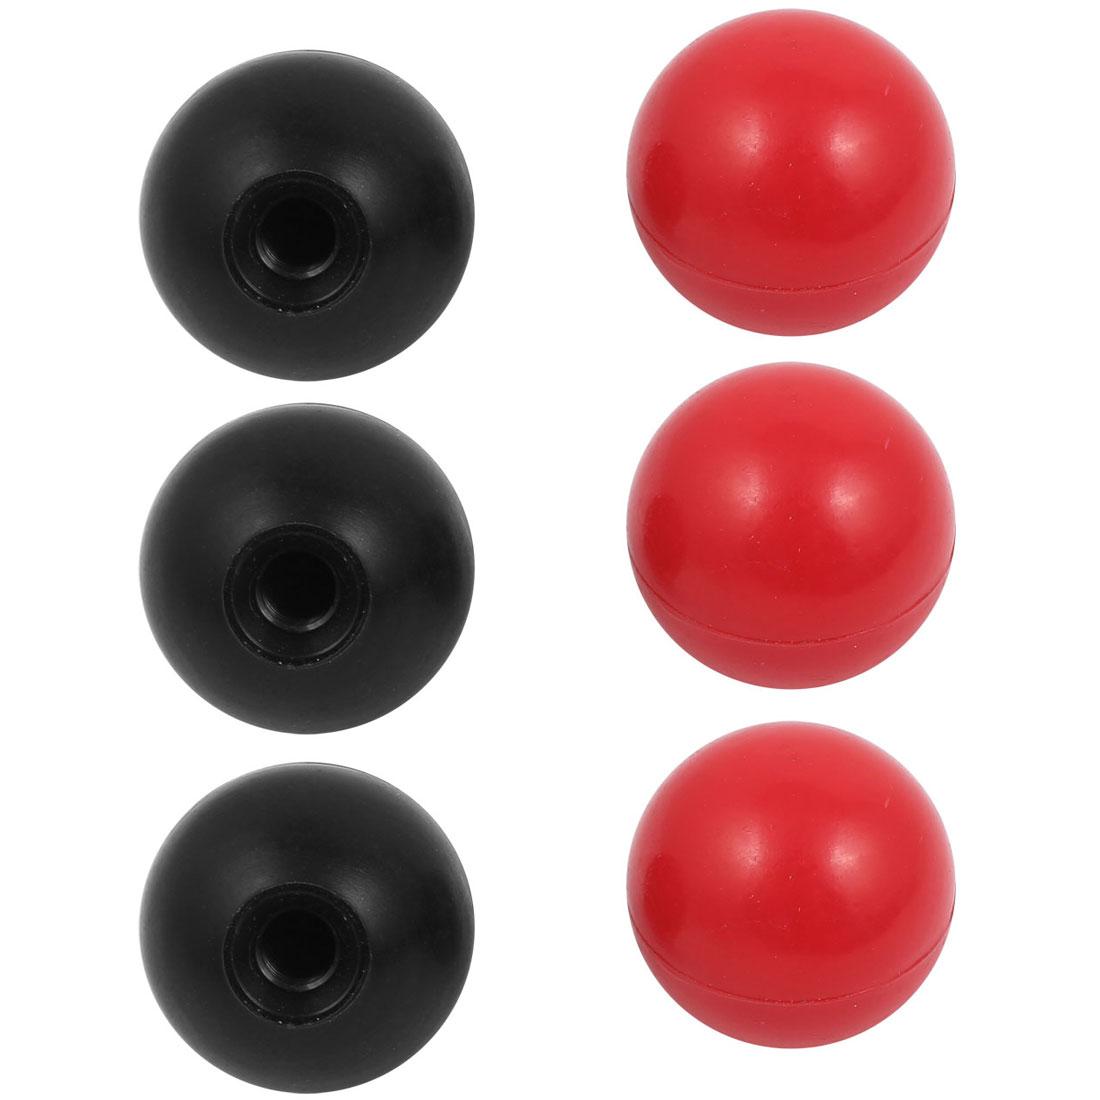 6 Pcs M10 x 35mm Plastic Ball Machine Tool Accessories Console Handle Black Red